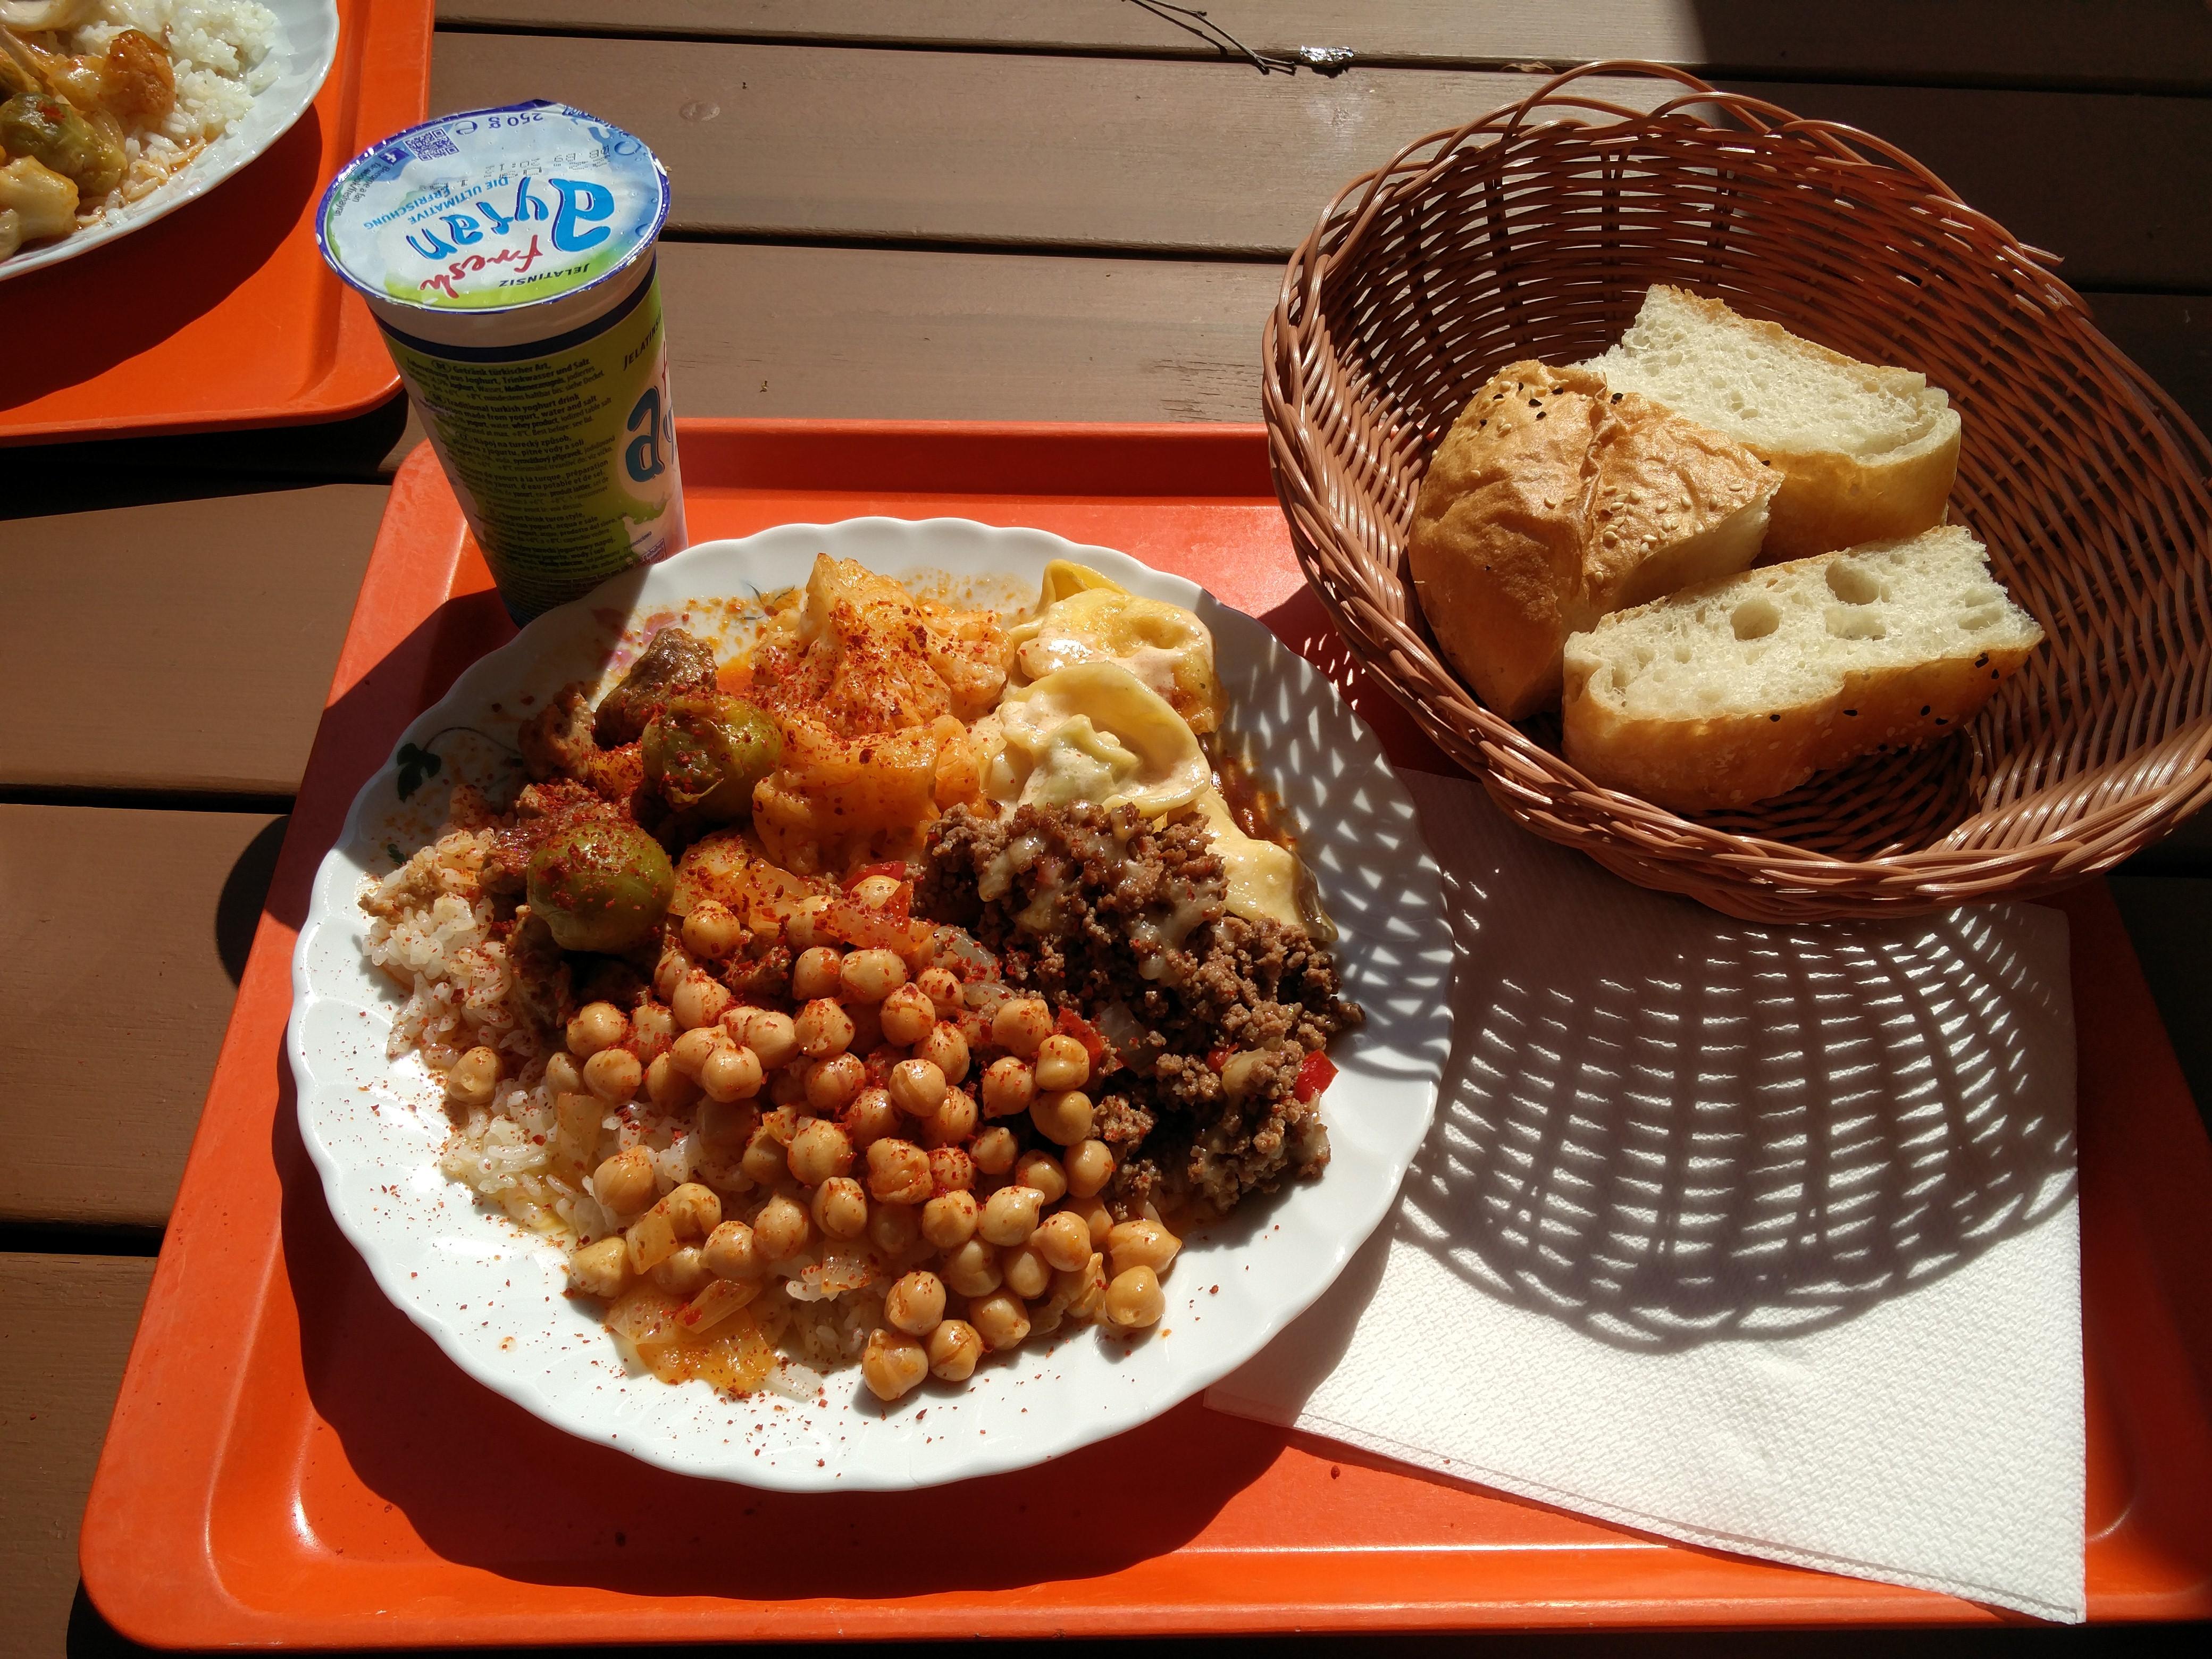 https://foodloader.net/nico_2016-08-19_reis-fleisch-gemuese-tortellini-kichererbsen-brot.jpg